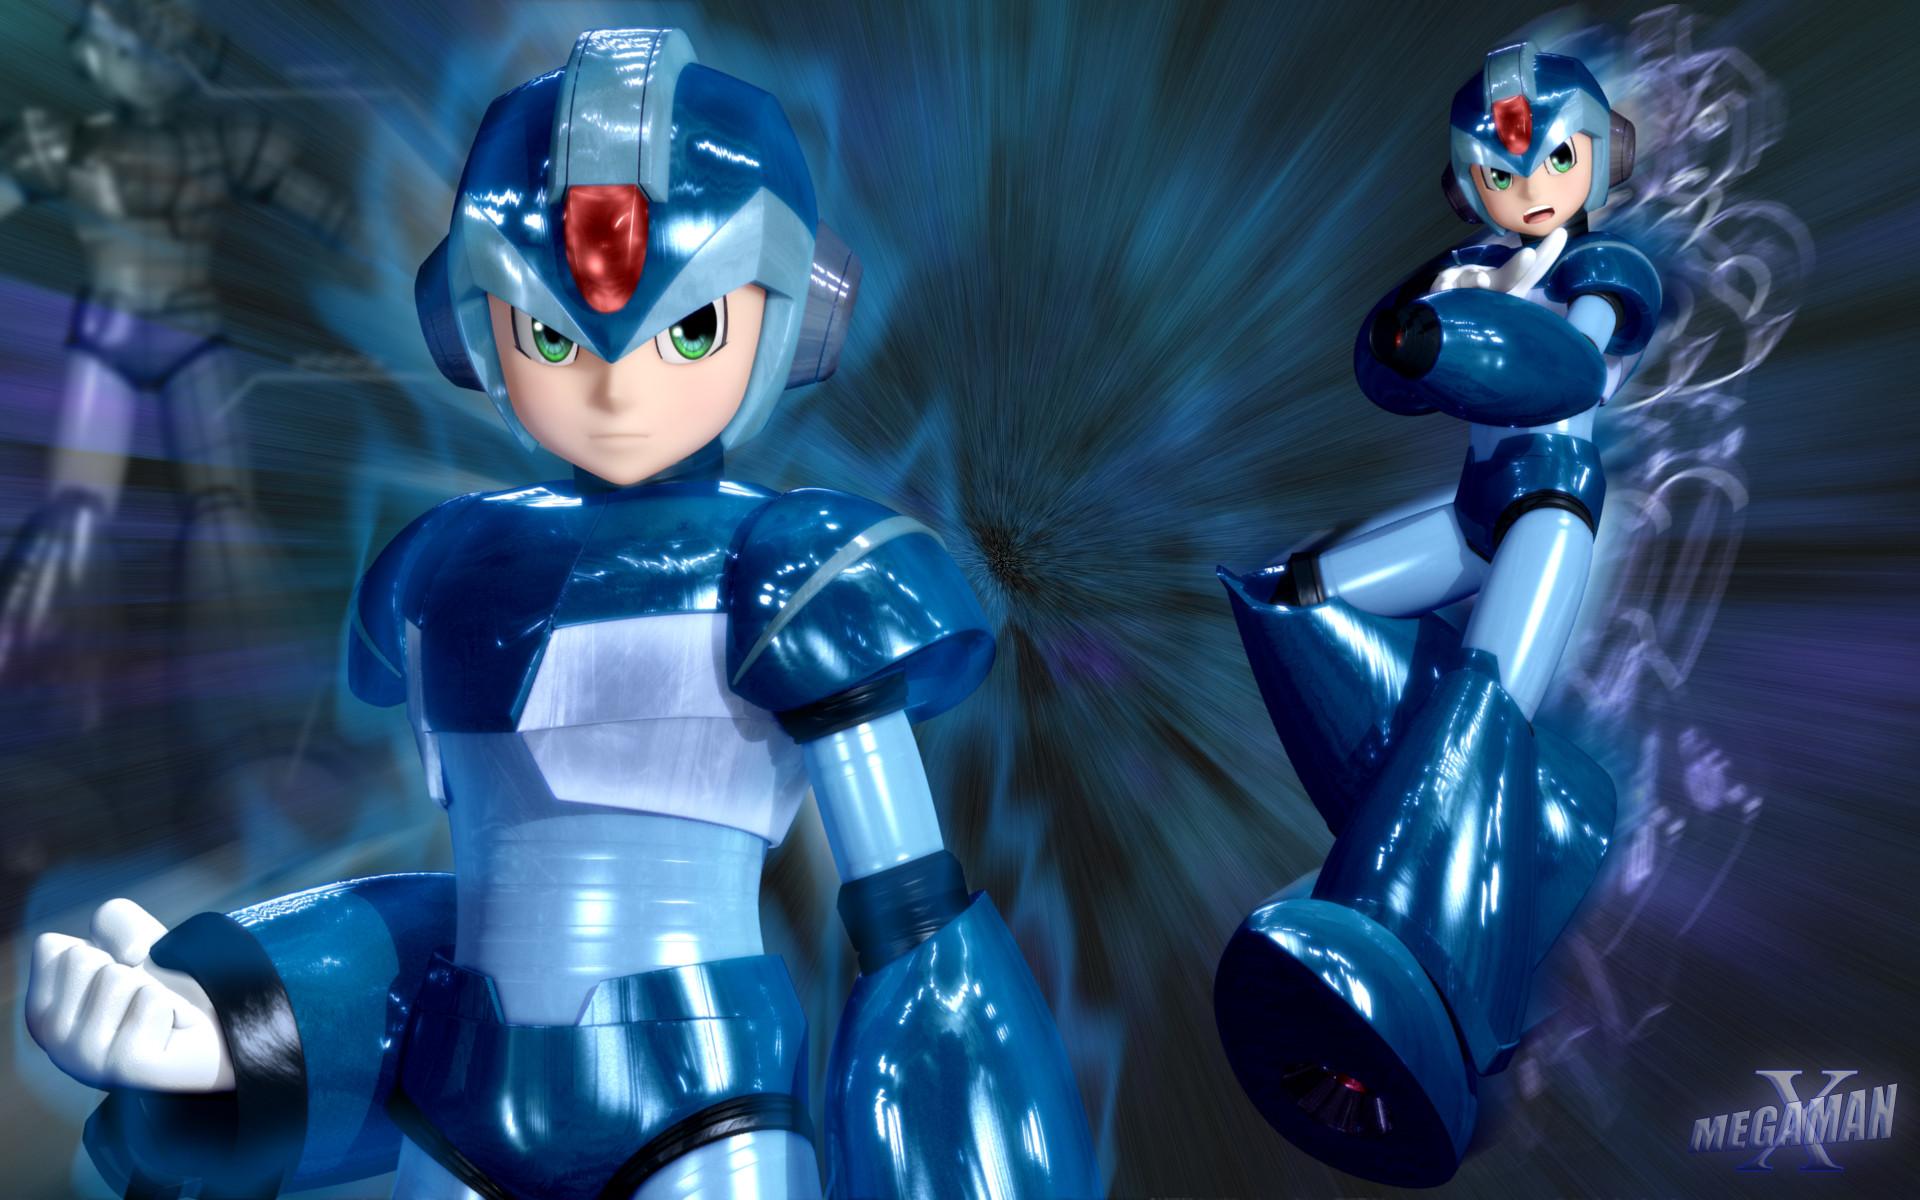 Megaman X by Primantis Megaman X by Primantis